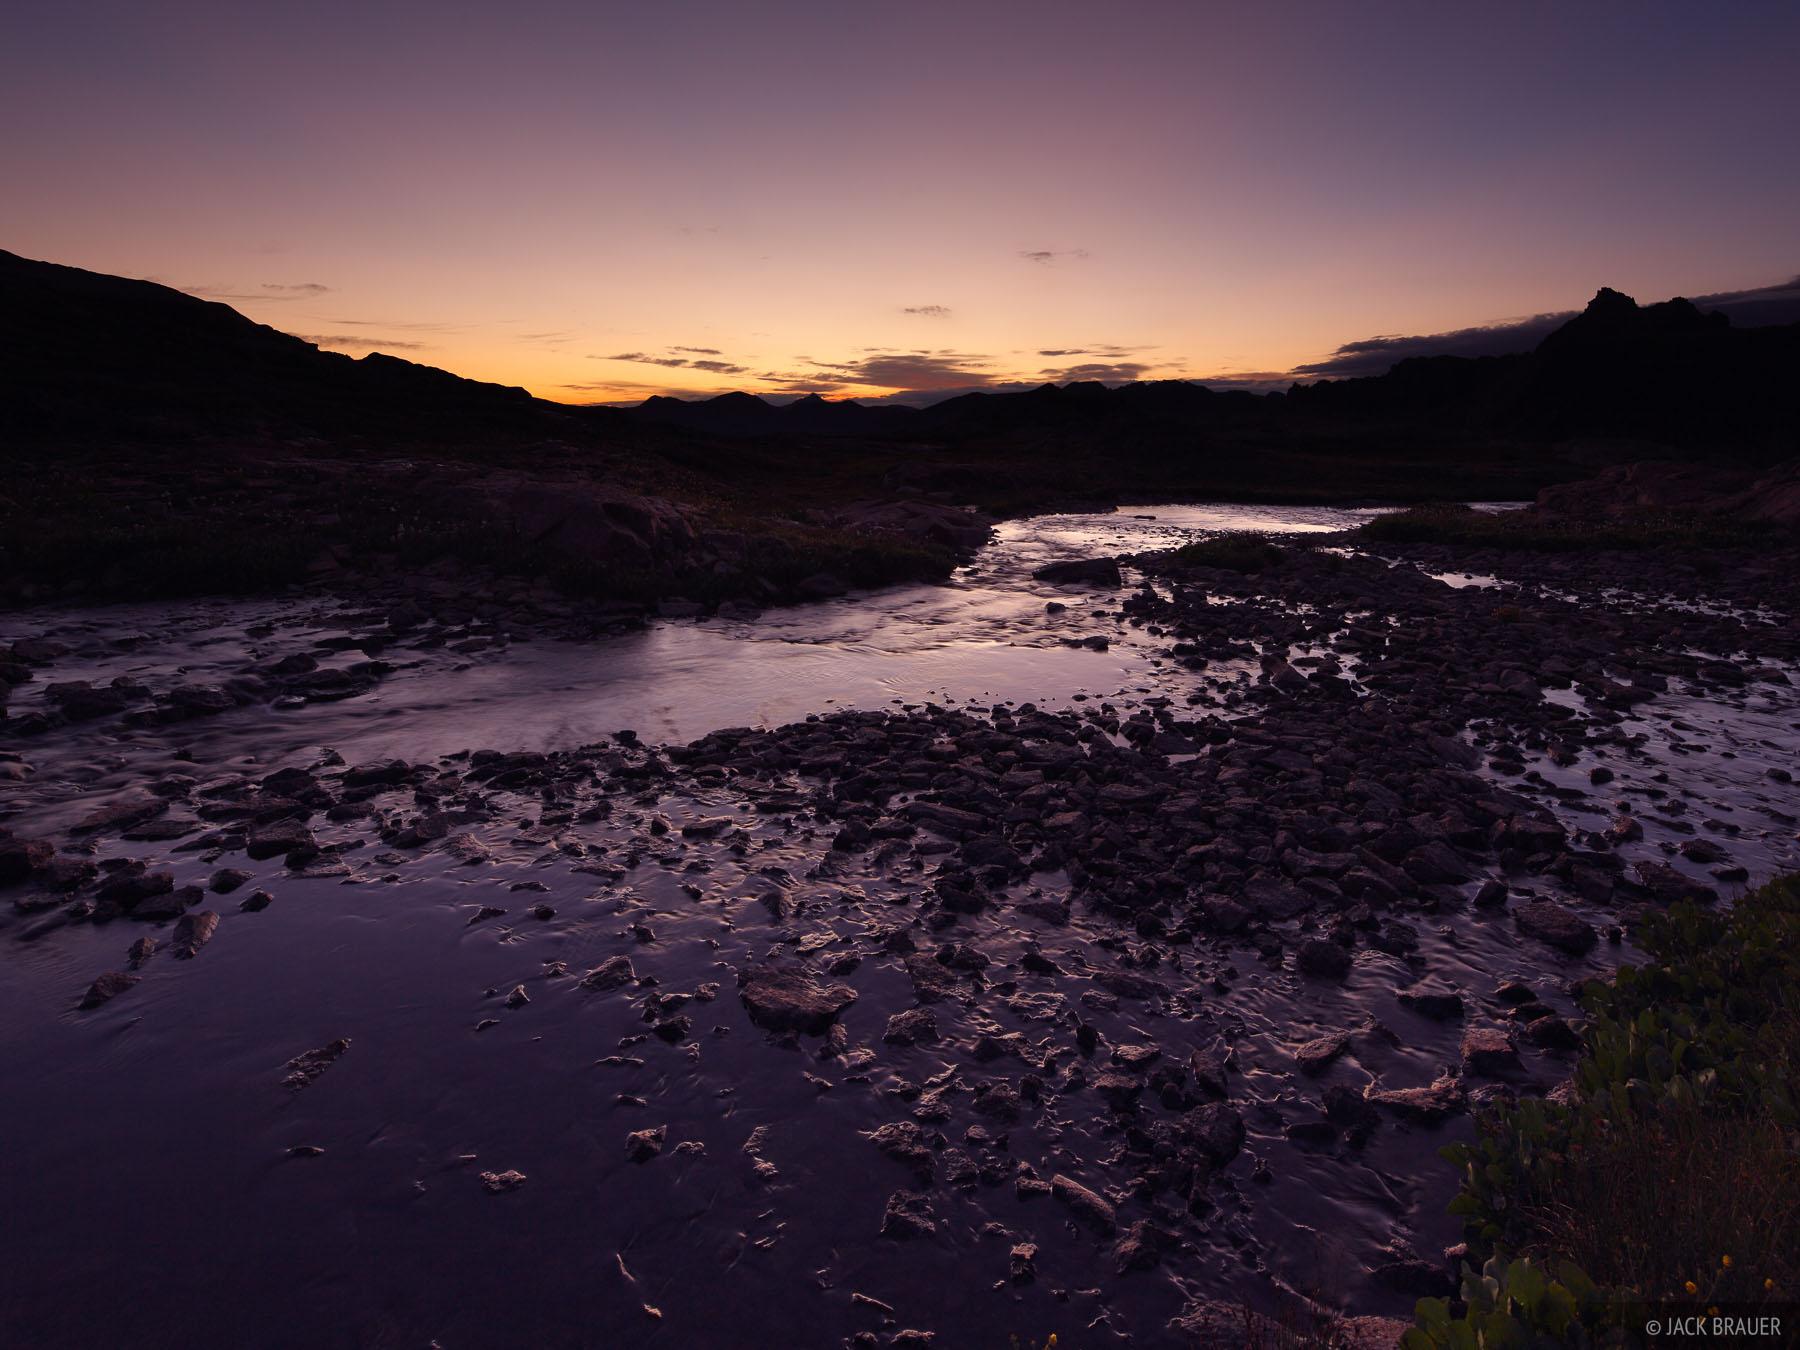 Weminuche Wilderness, San Juan Mountains, Colorado, dawn, photo